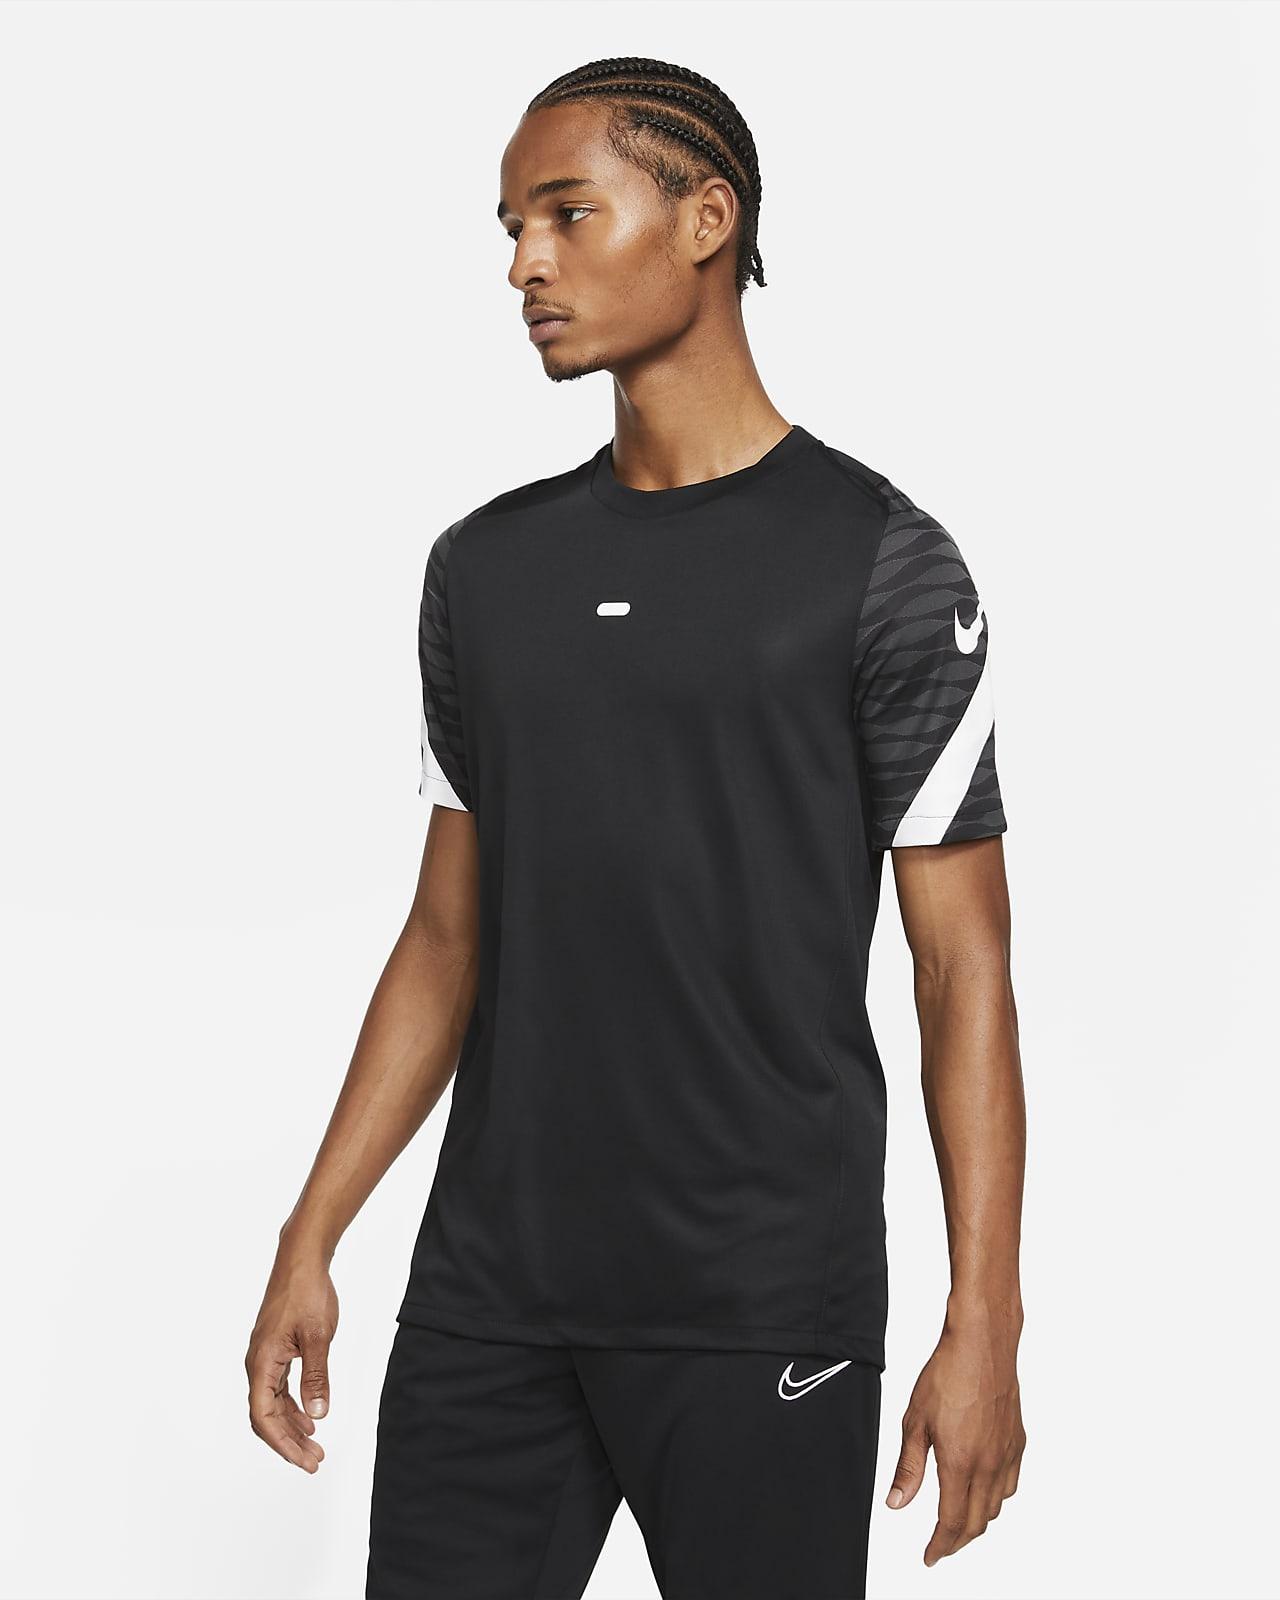 Nike Dri-FIT Strike Men's Short-Sleeve Football Top